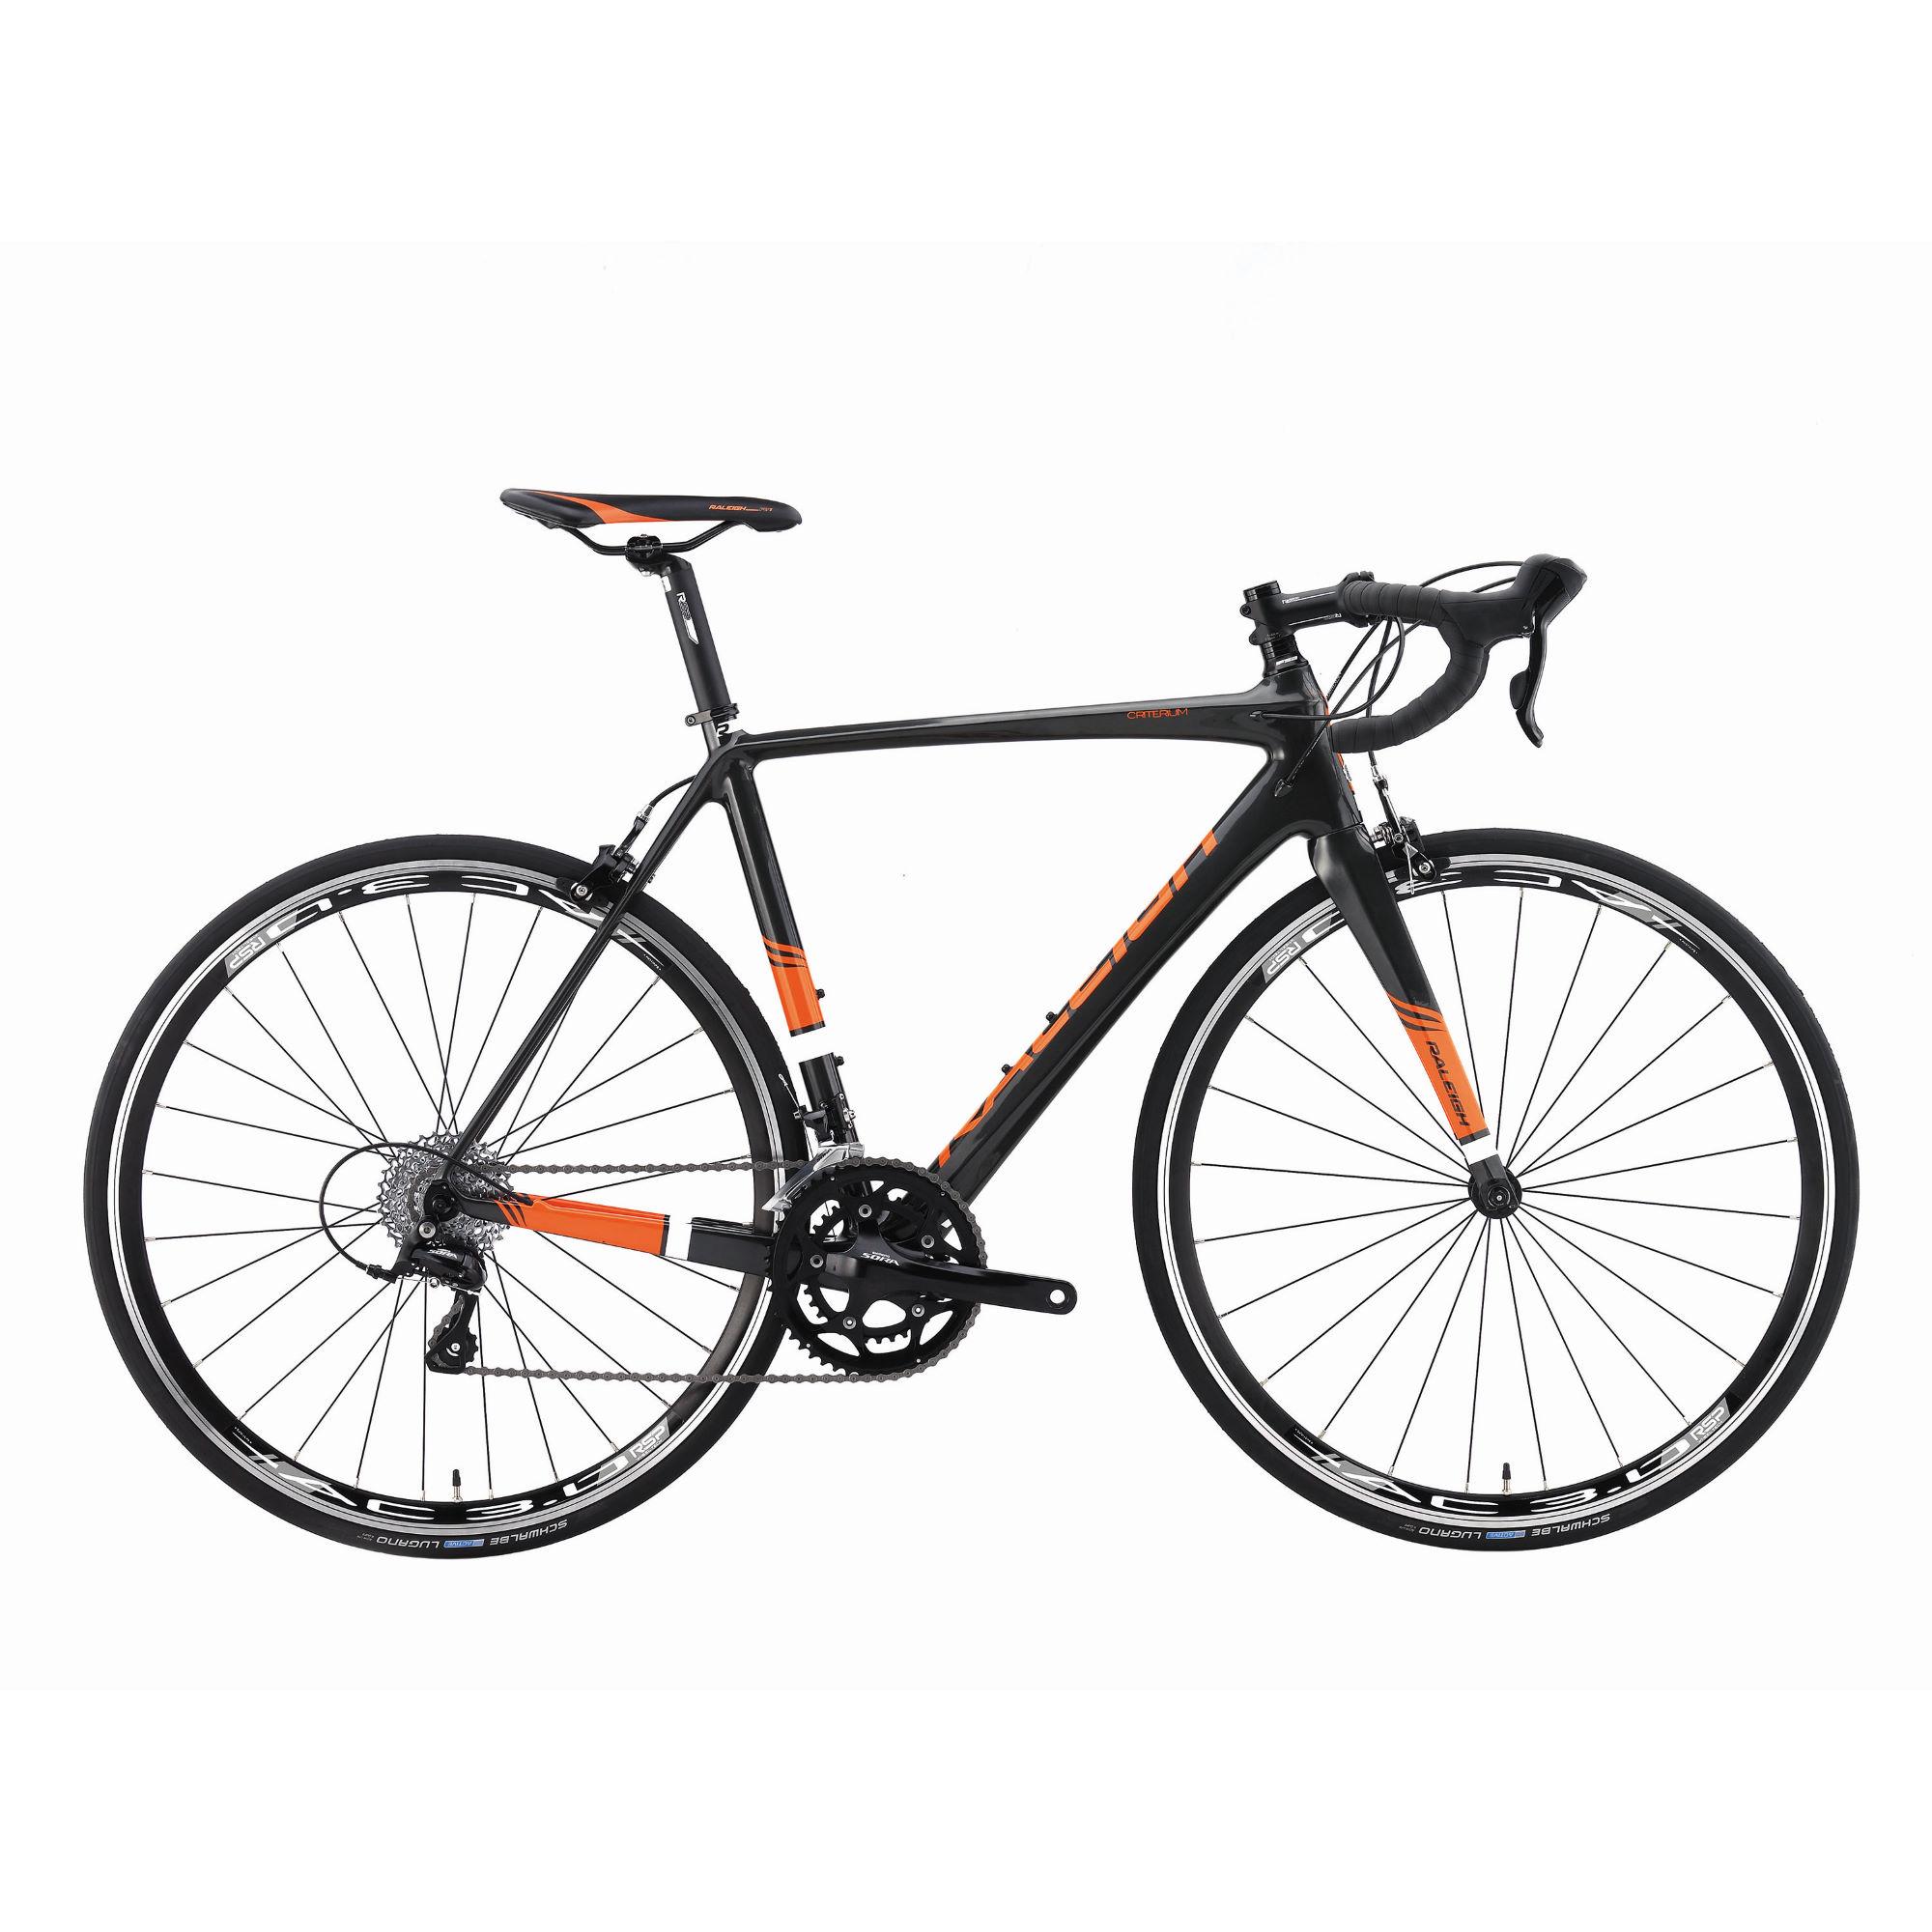 raleigh-criterium-elite-2016-road-bike-road-bikes-black-clearance-rcre49bk